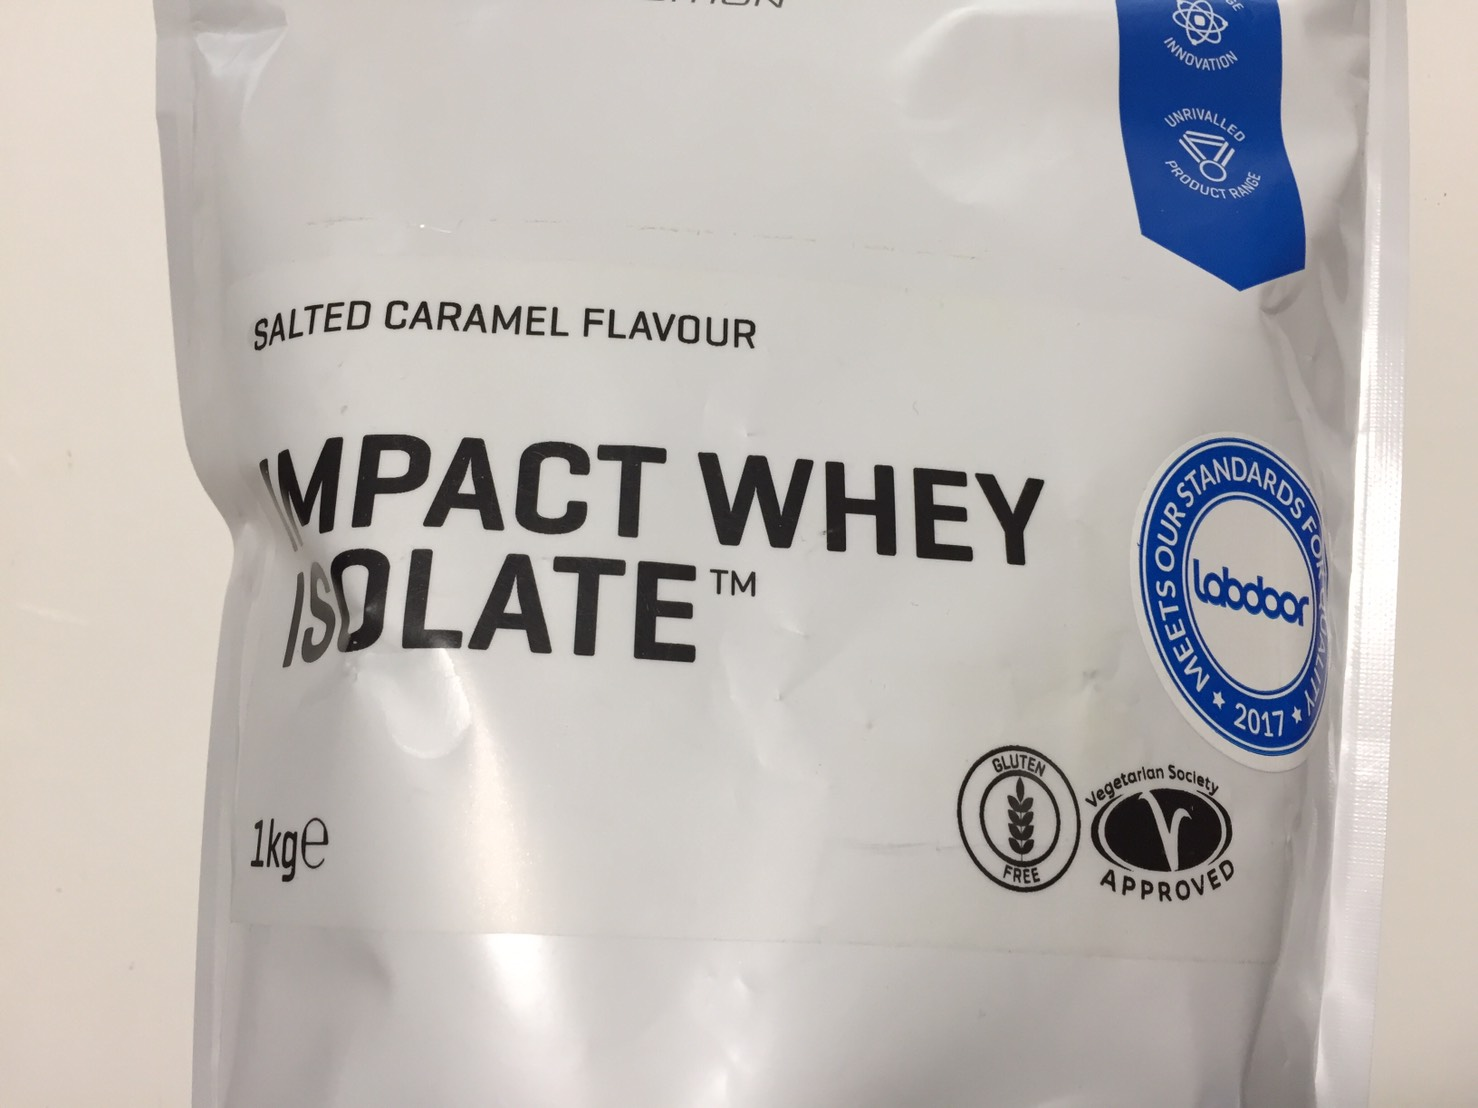 【WPI】IMPACT 分離ホエイプロテイン (アイソレート)「SALTED CARAMEL FLAVOUR(塩キャラメル味)」